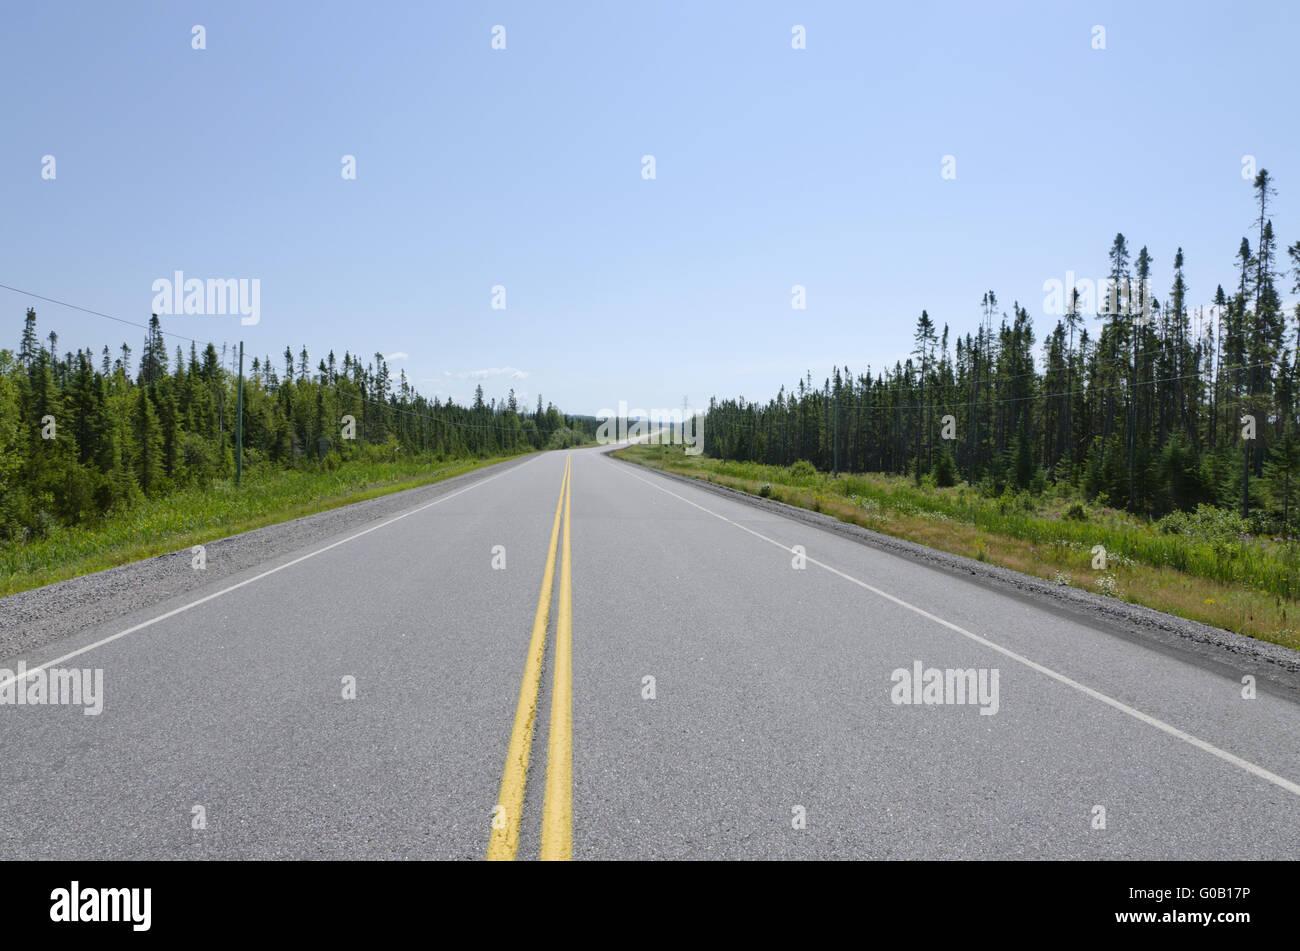 TransCanada highway - Stock Image